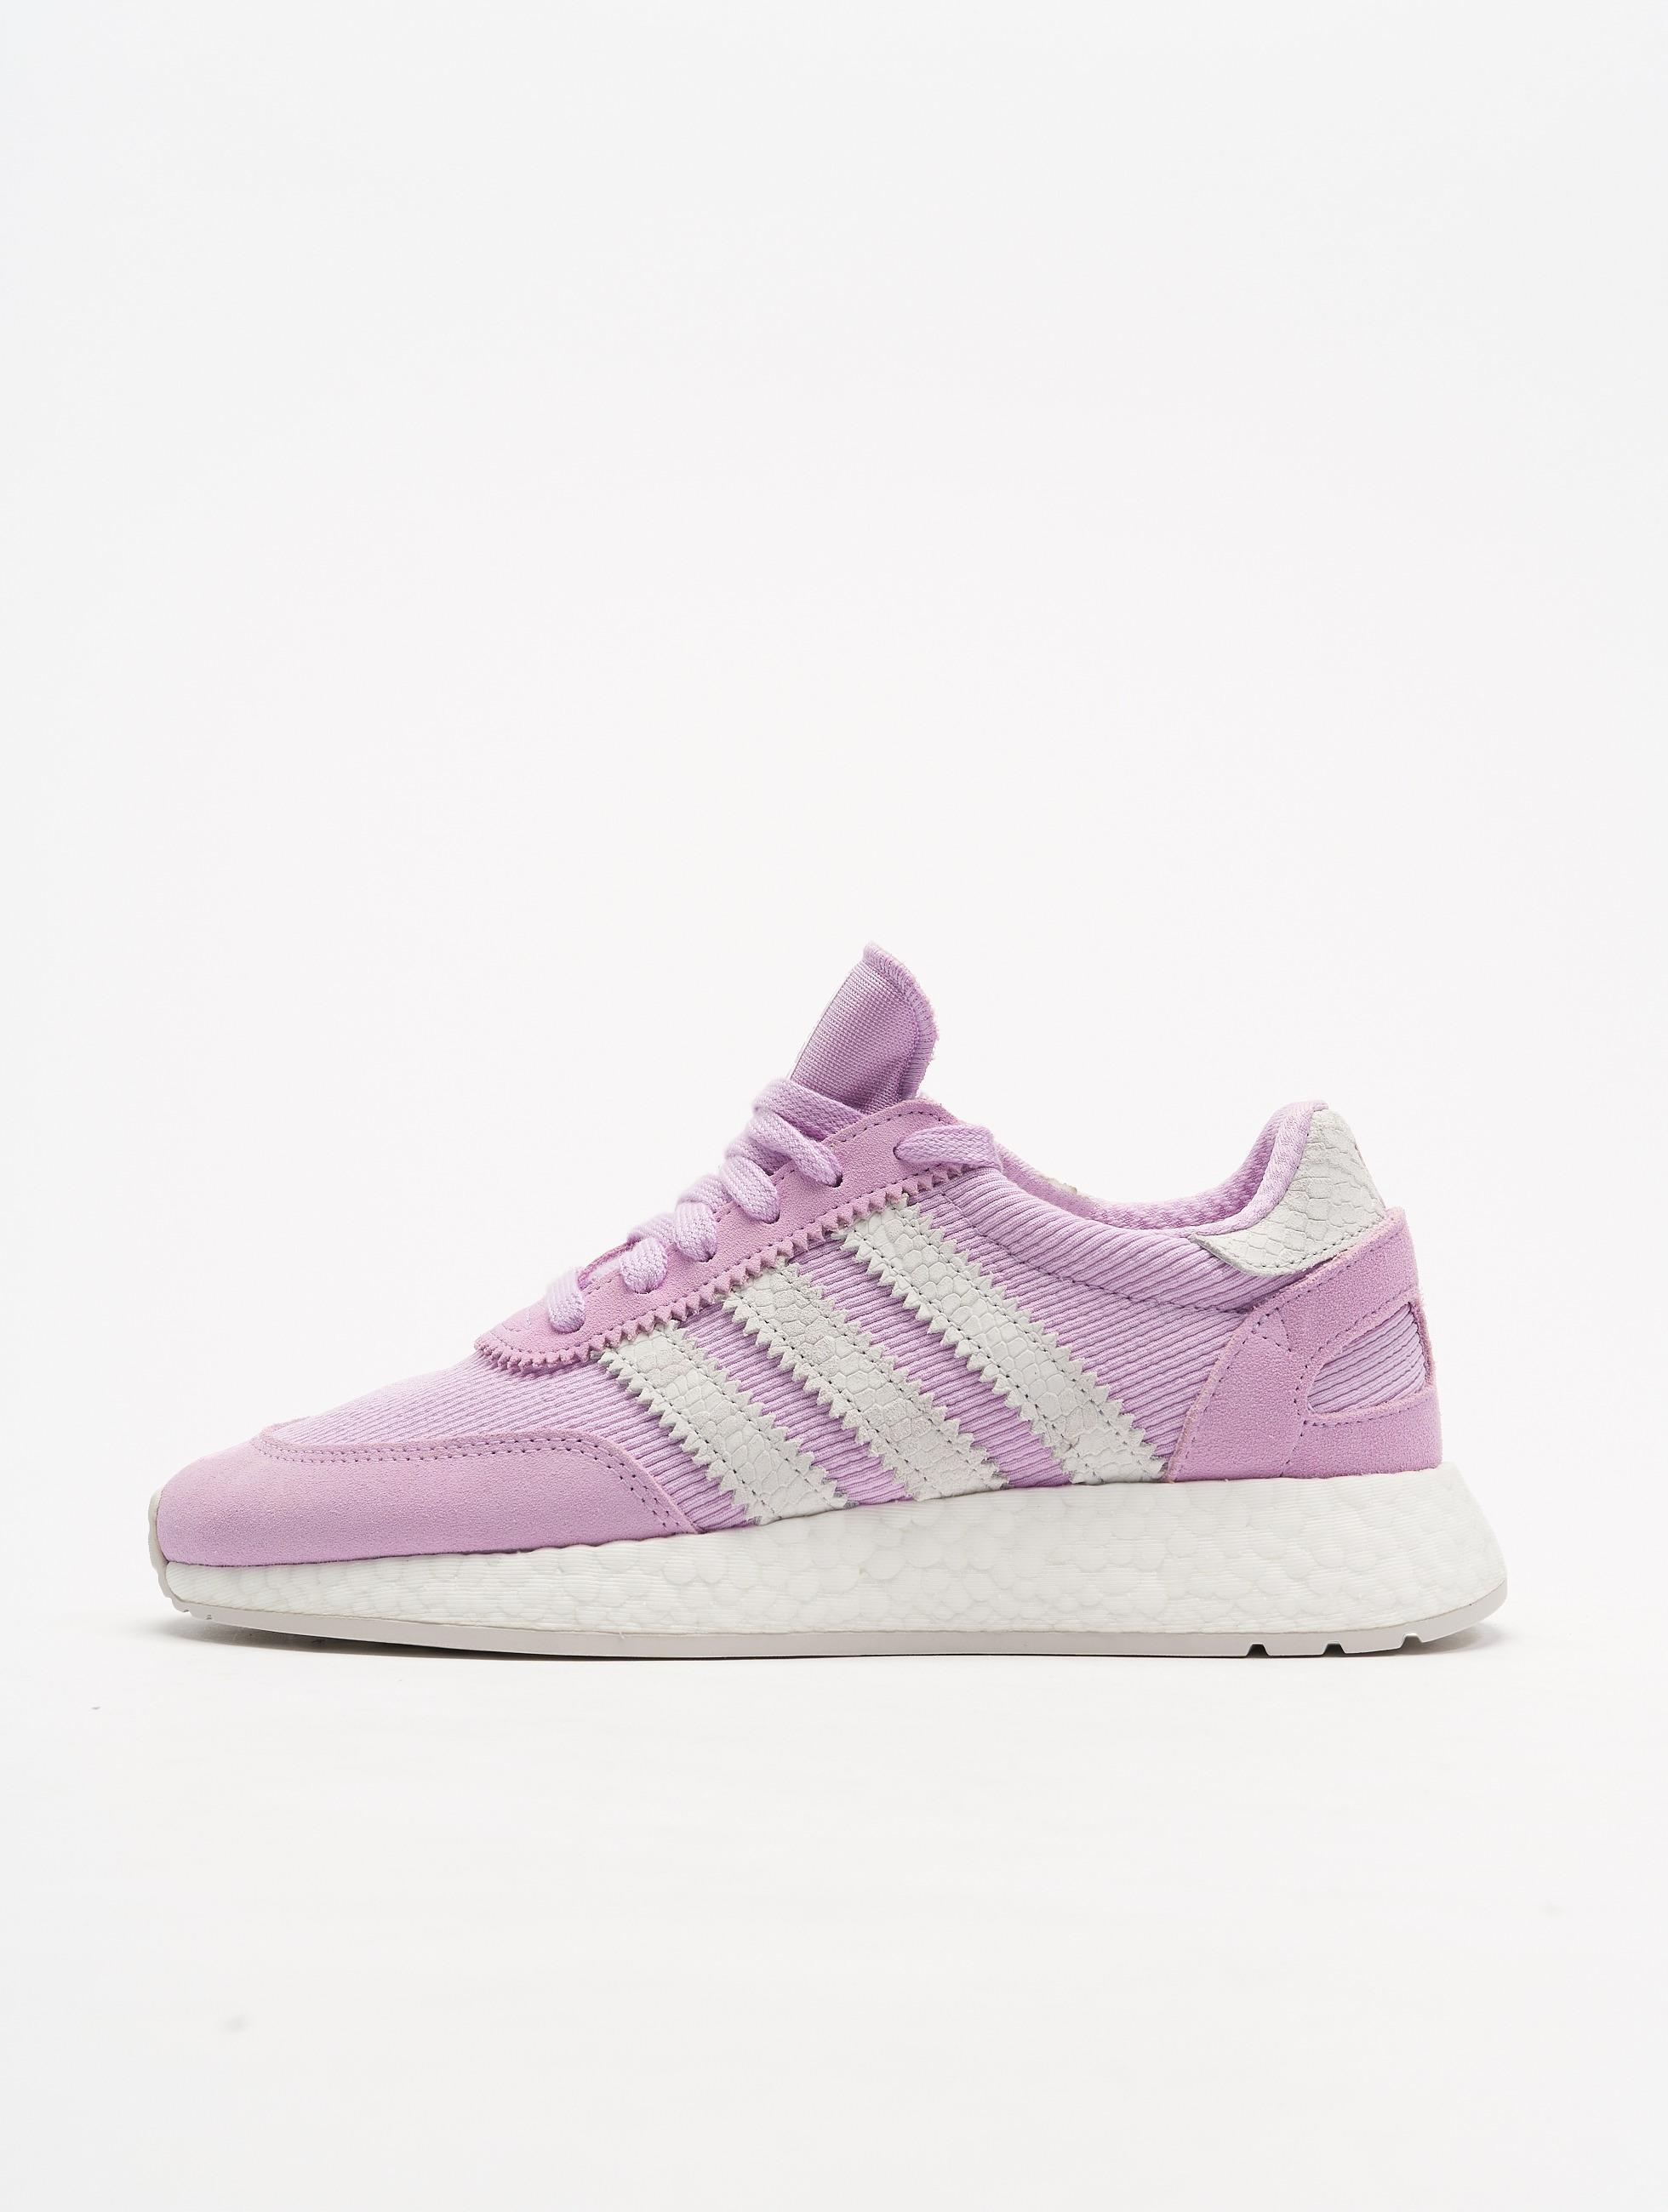 Adidas lila mocka Sneakers